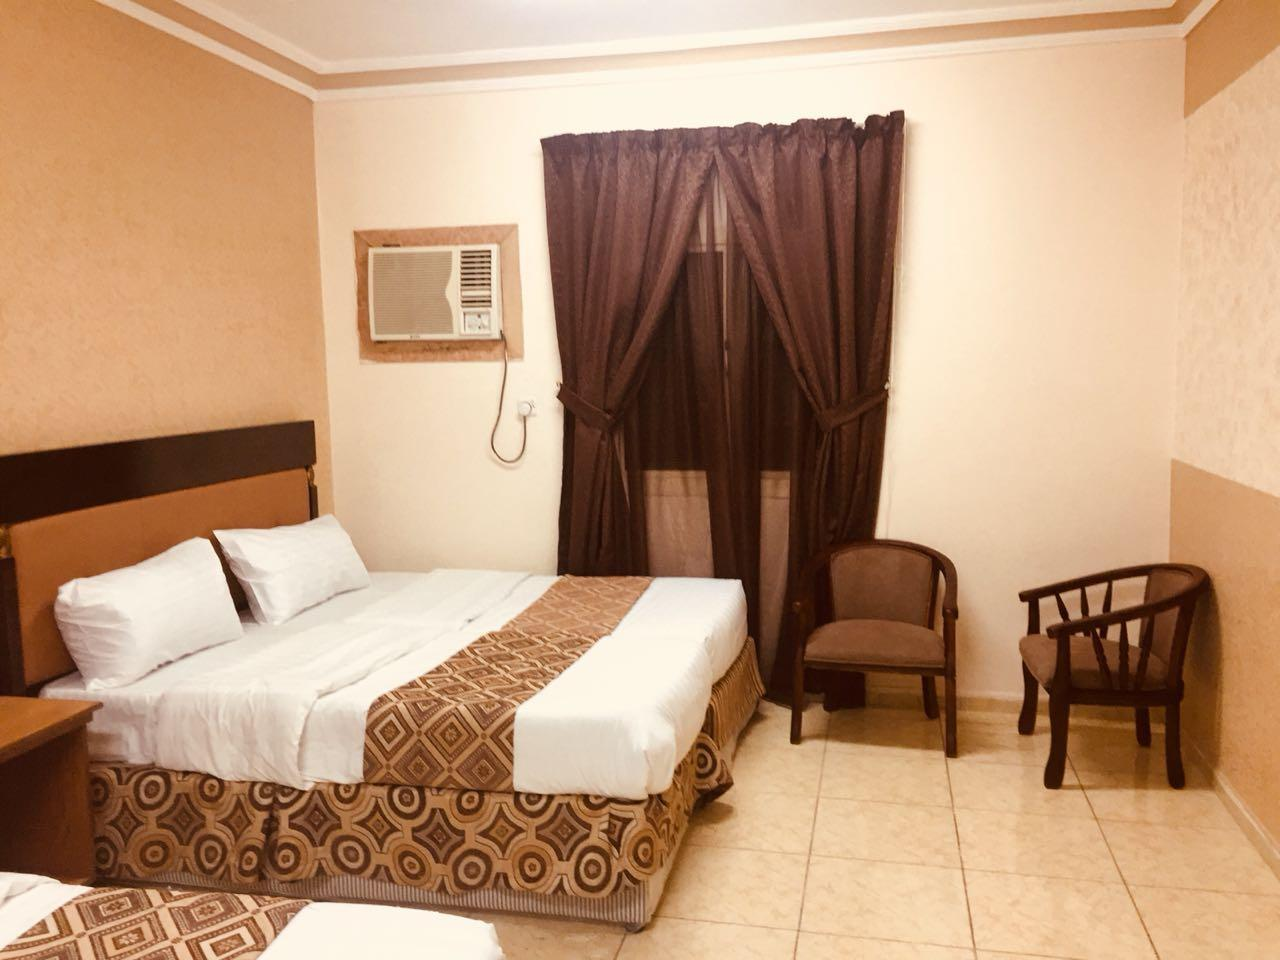 HOTEL WISPER TAIBA